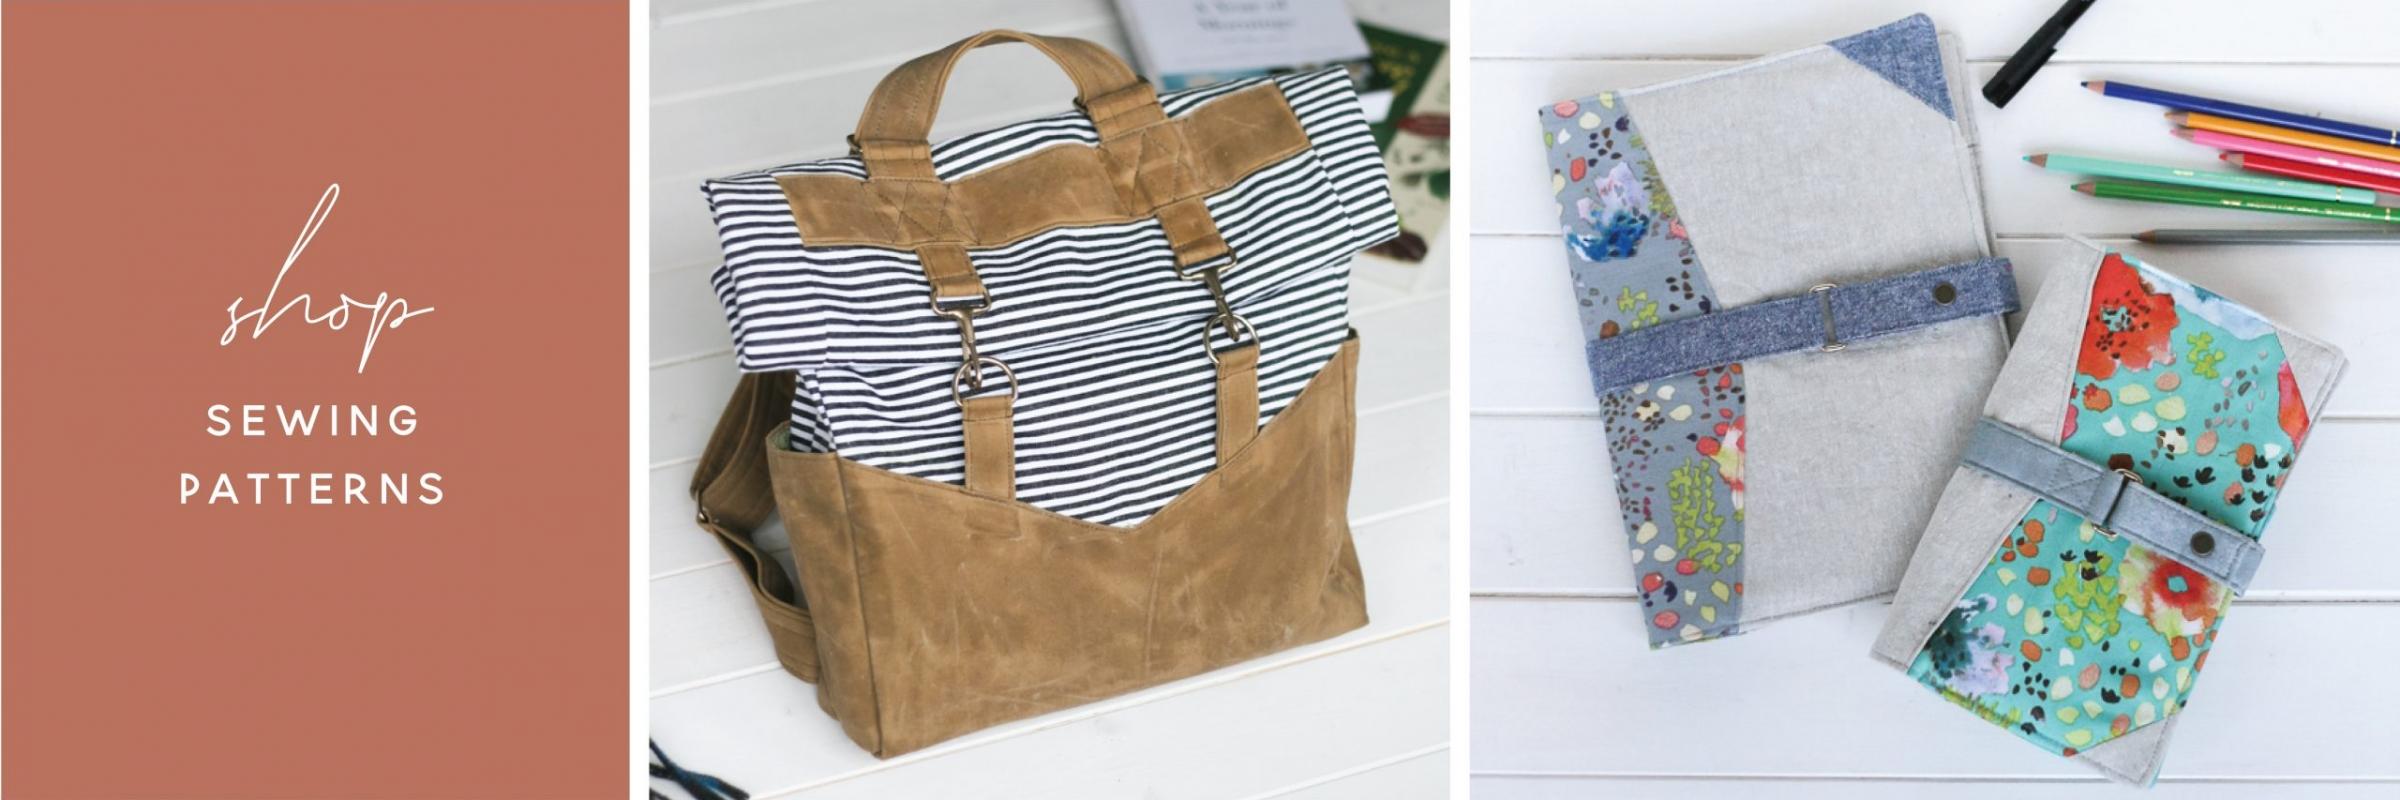 Shop Sewing Patterns | Radiant Home Studio